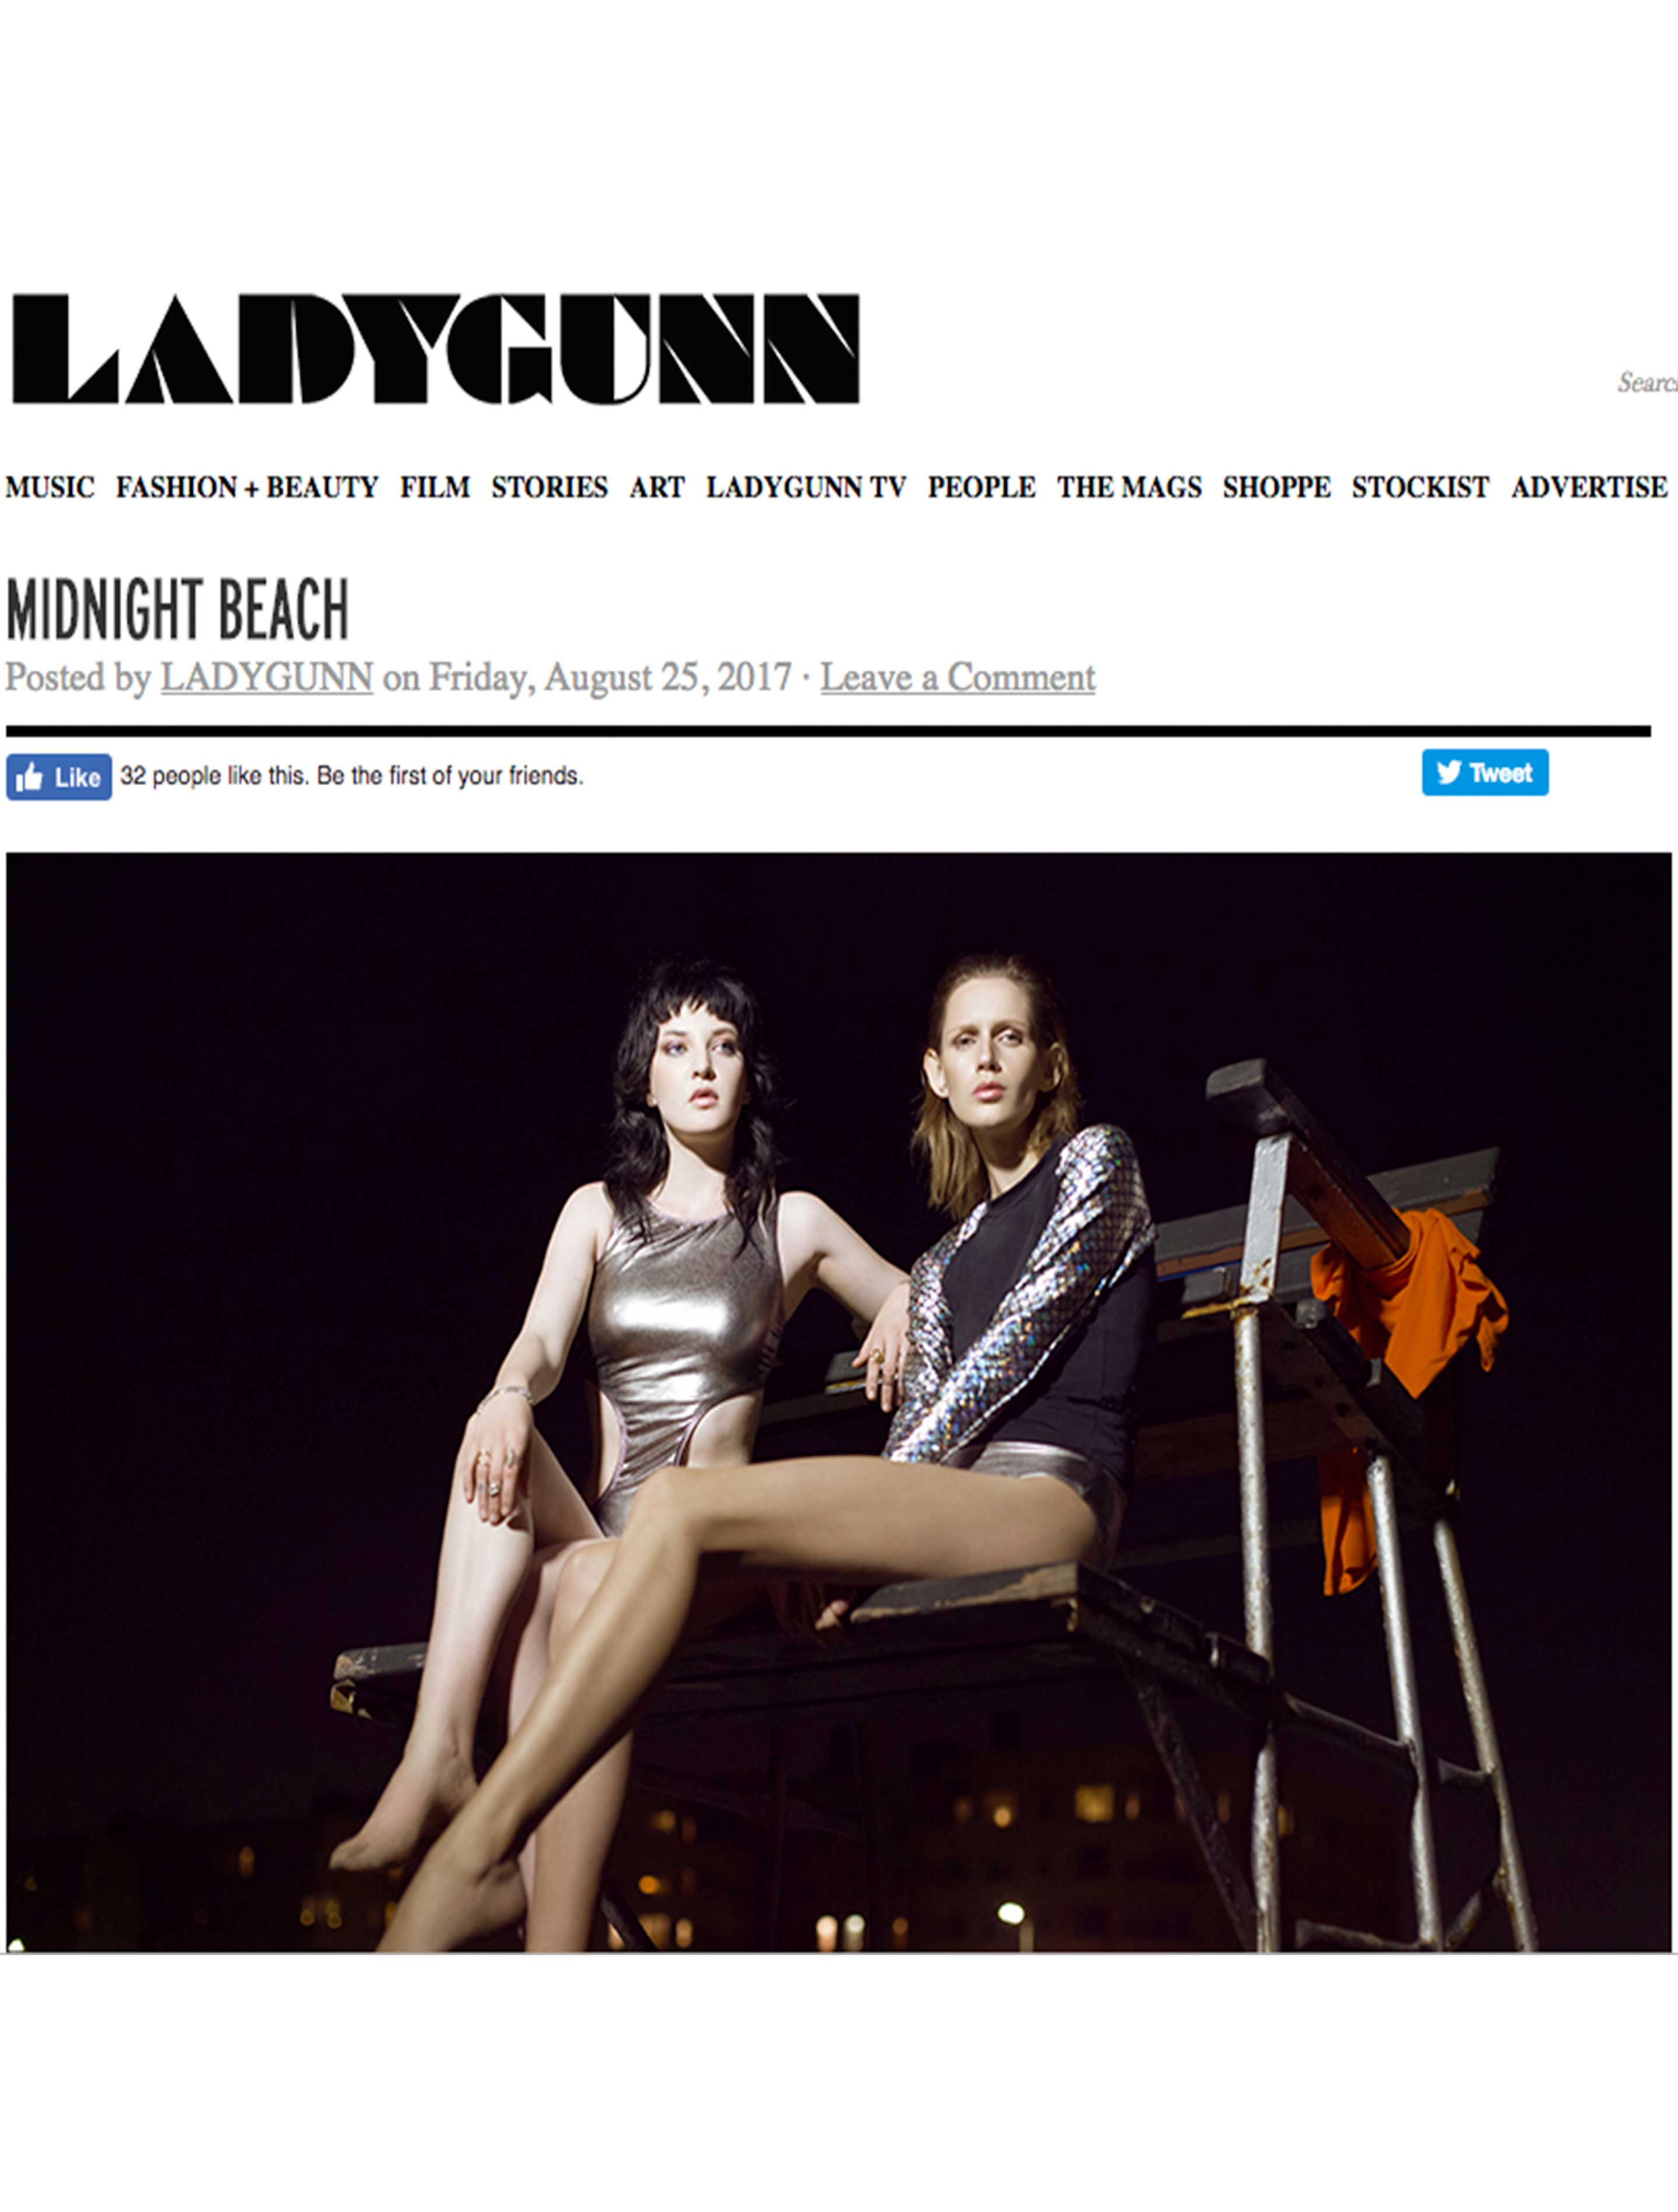 LadyGunn Online, August 25, 2017